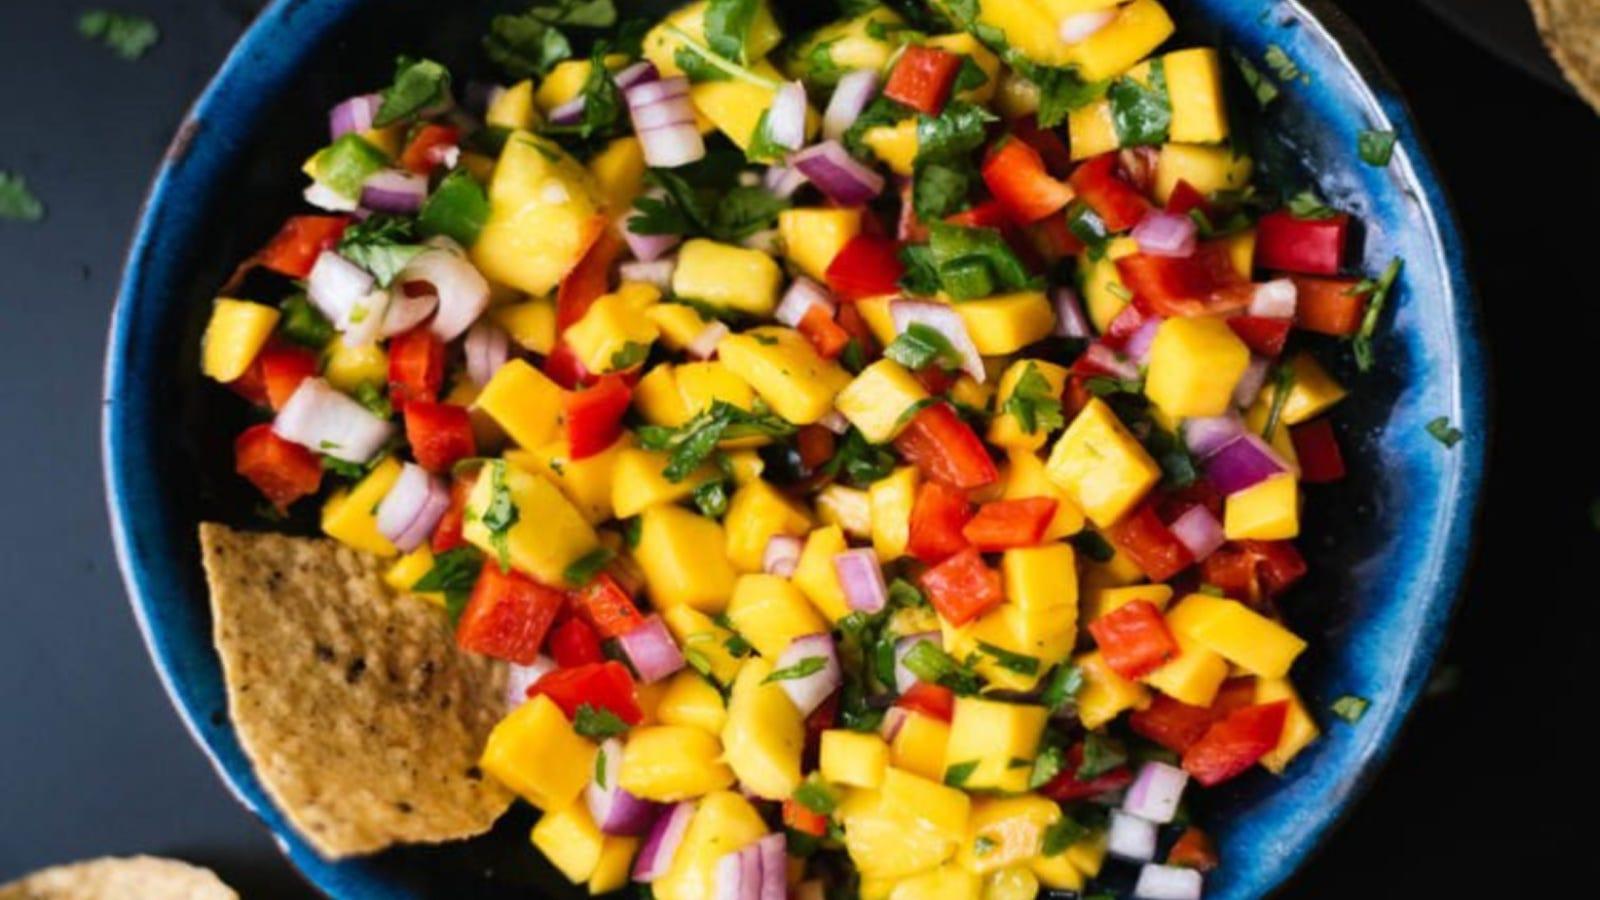 A bowl of fresh mango salsa using ingredients like mango, bell pepper, onion and cilantro.